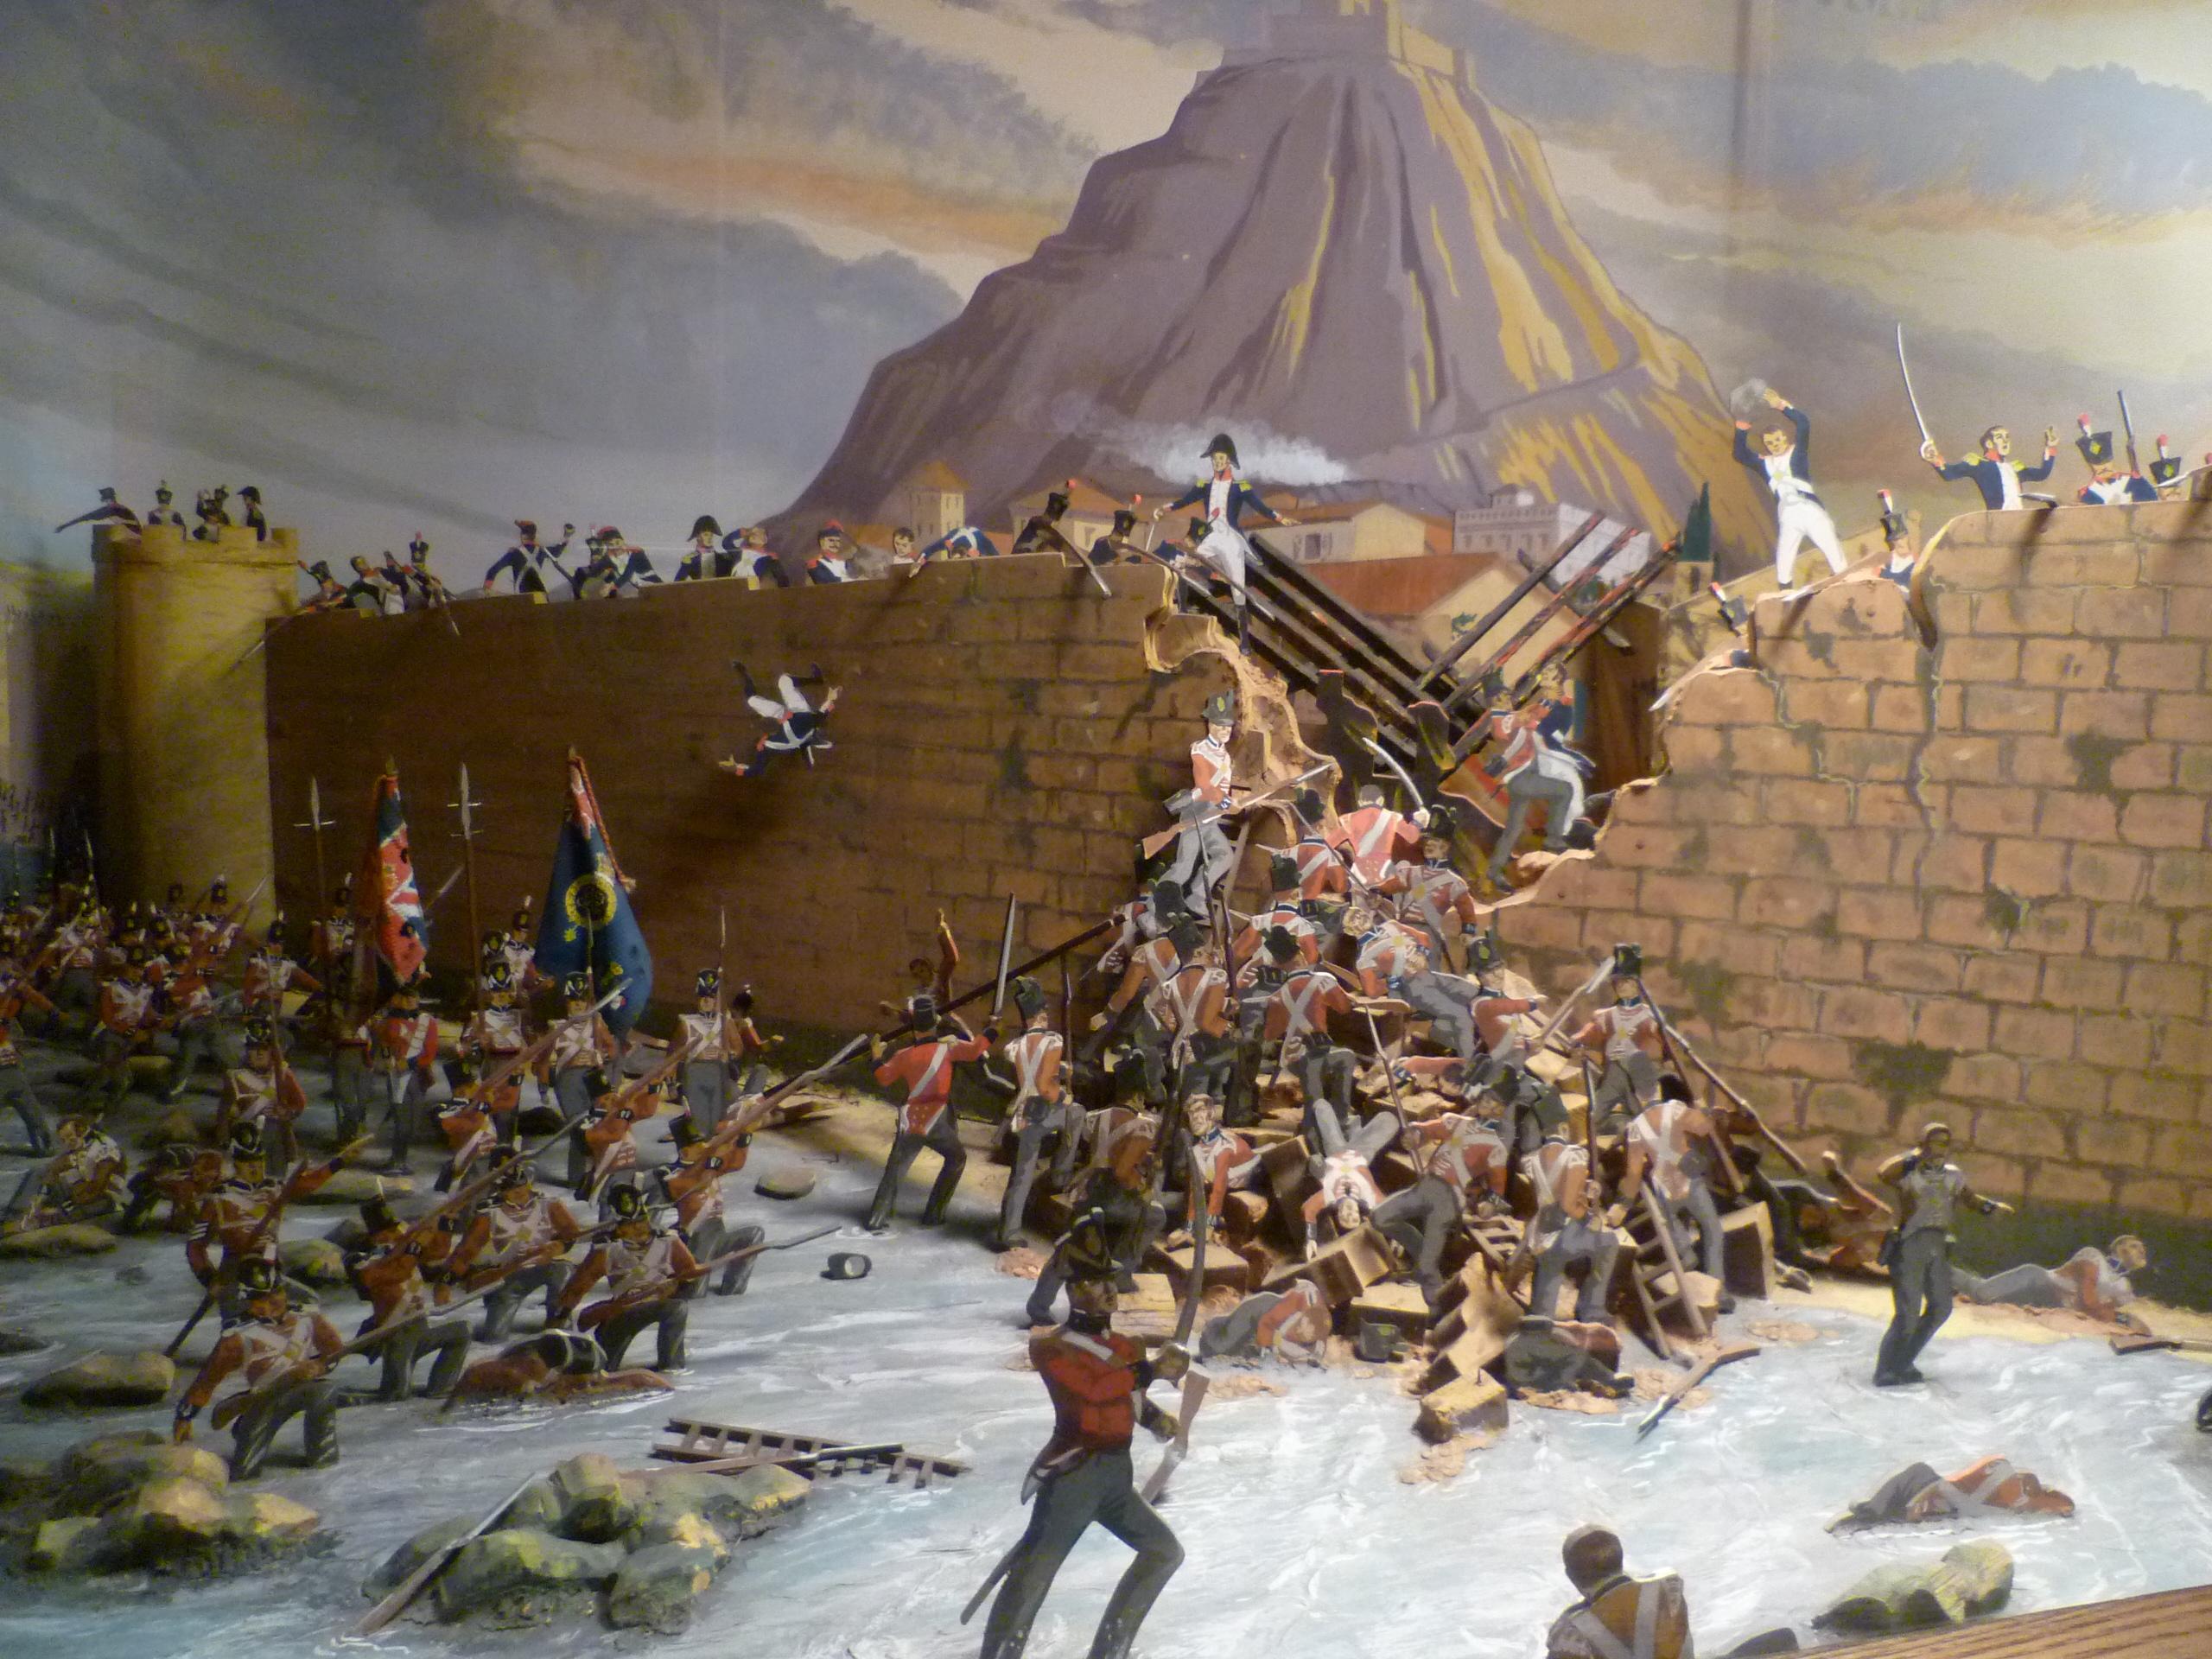 File:The capture of San Sebastián, July 1813.jpg